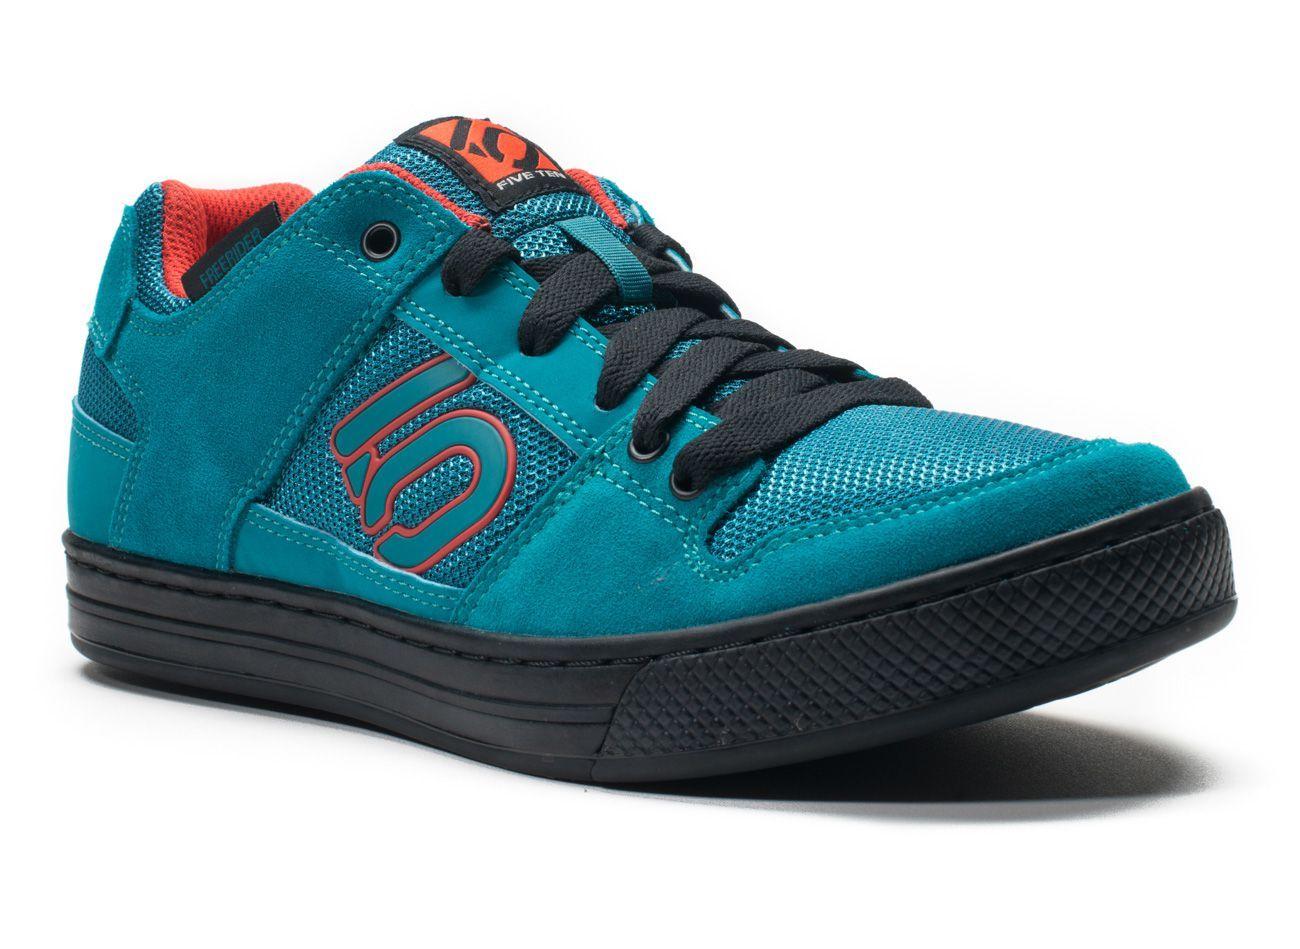 Adidas Five Ten | Five Ten Brand Landing Page